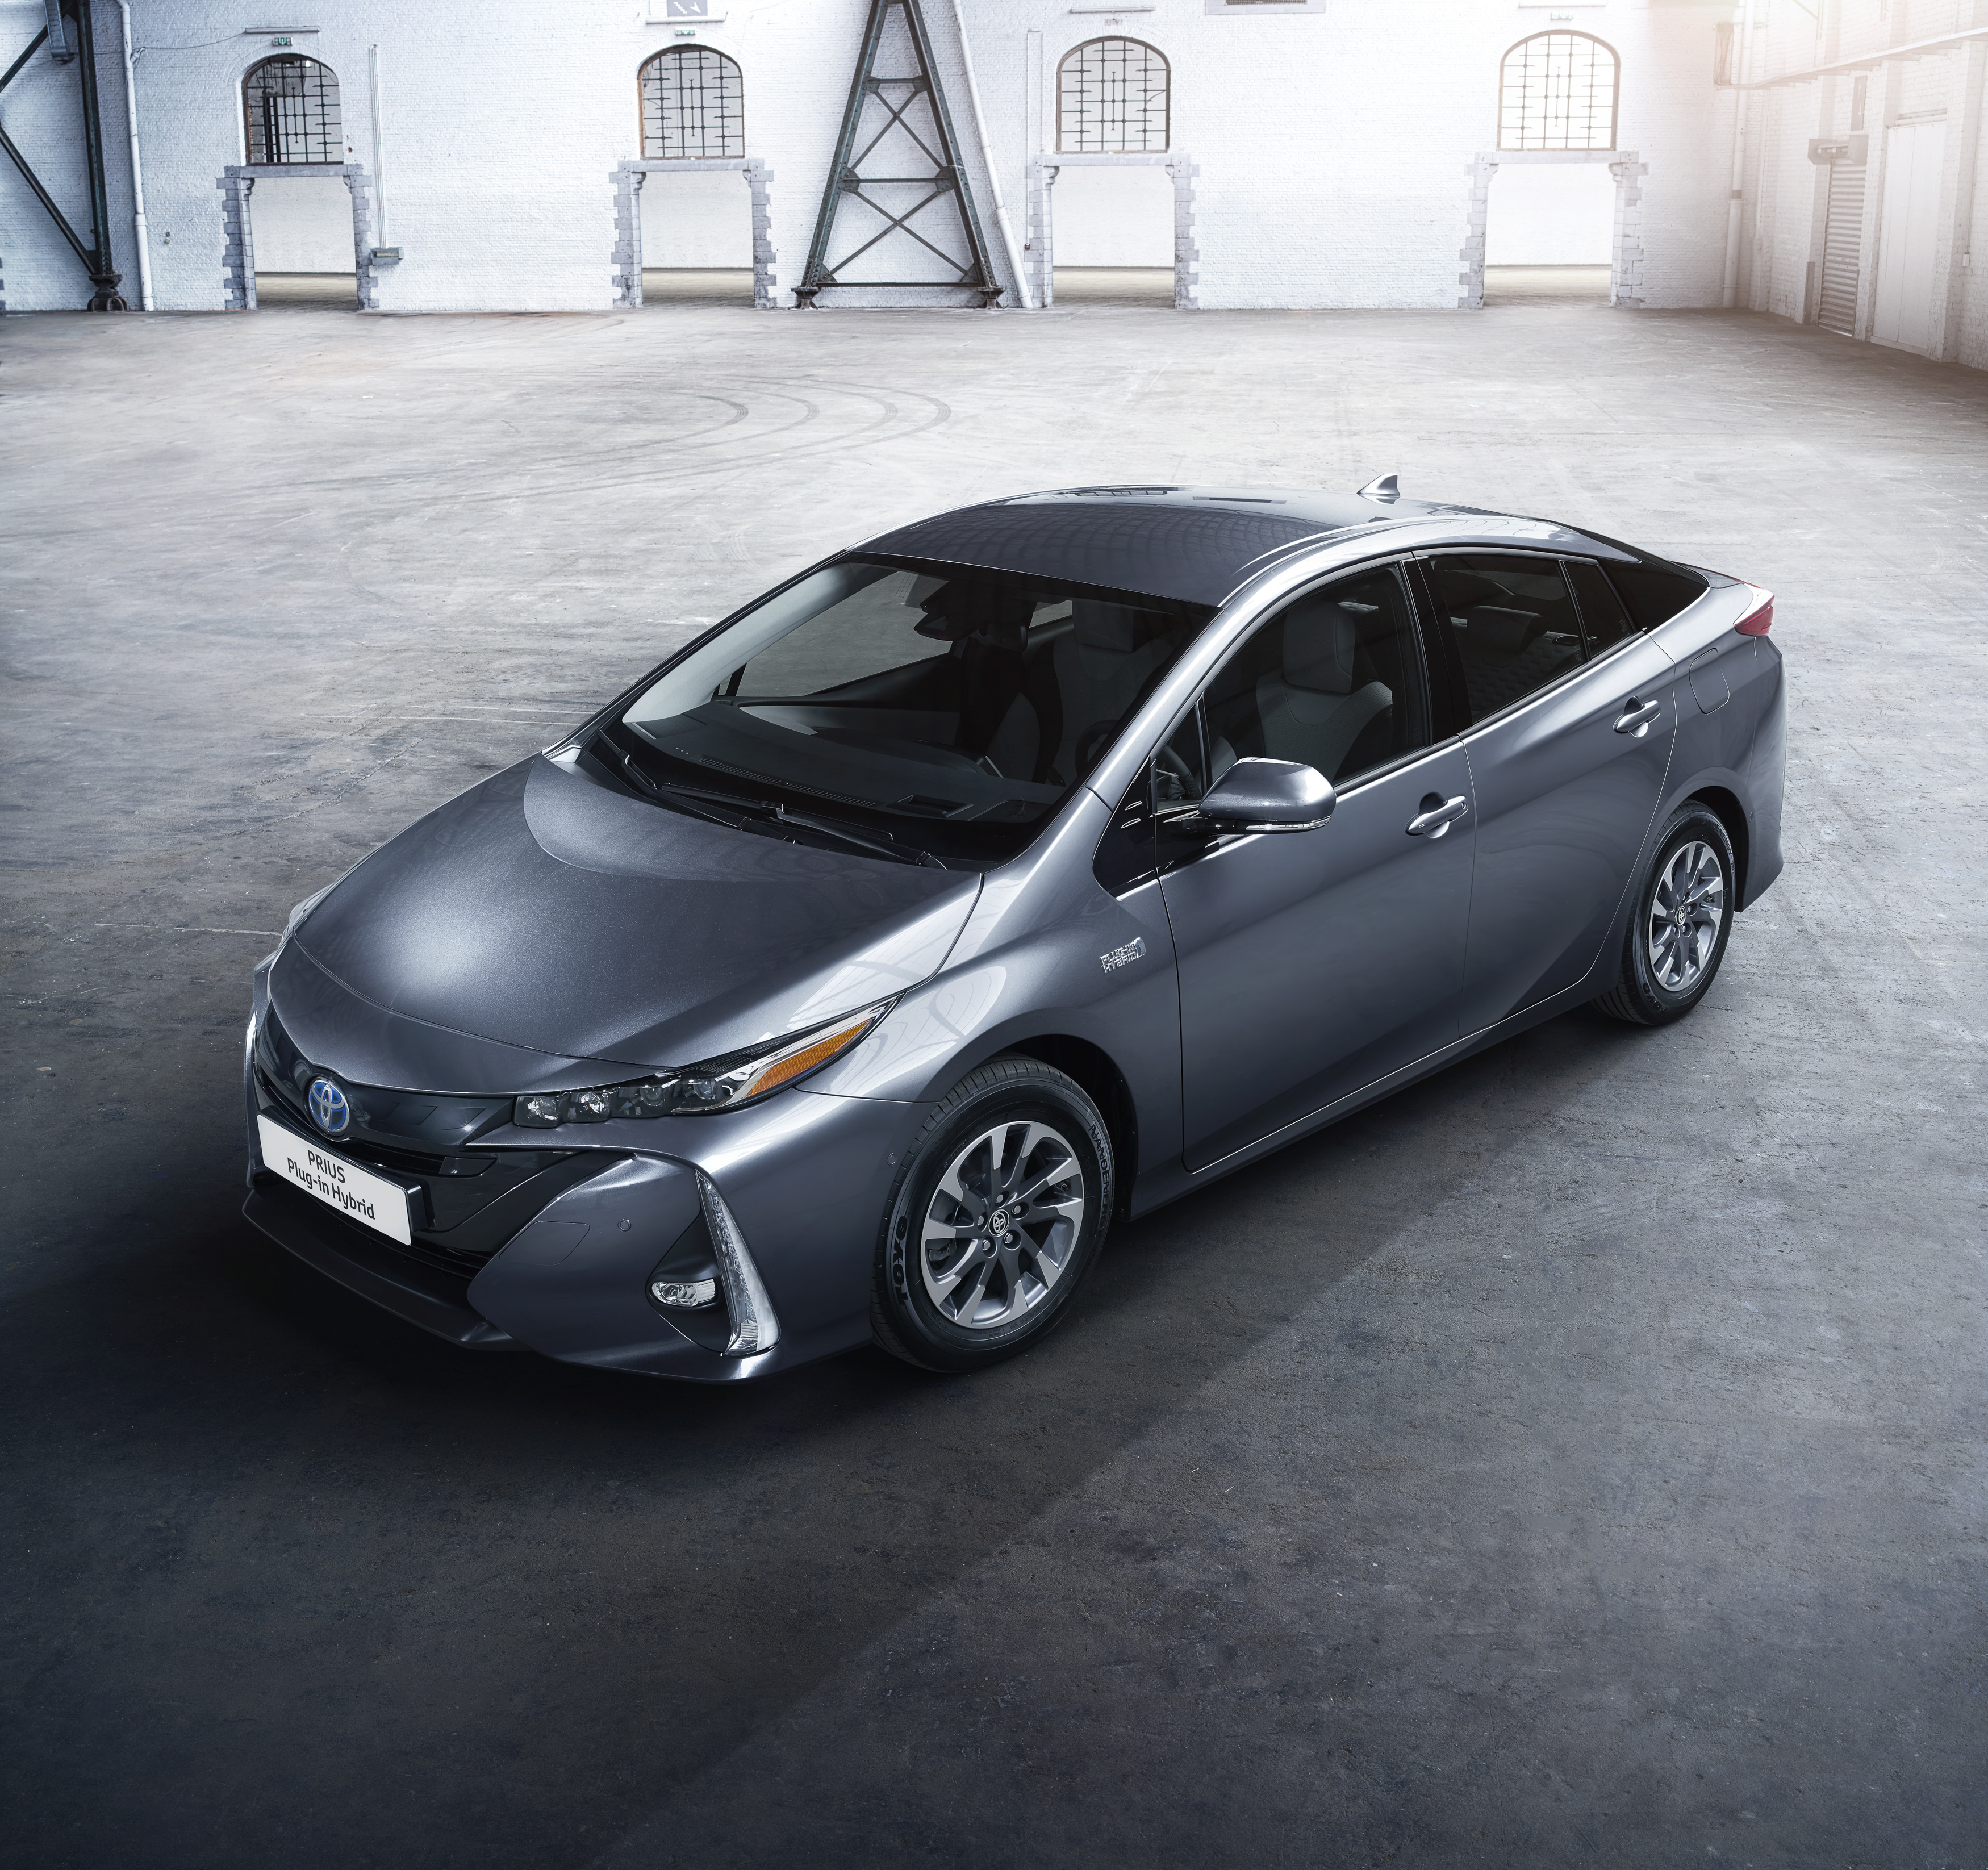 New Toyota Prius Plug-in Hybrid – double the EV range Image 612847